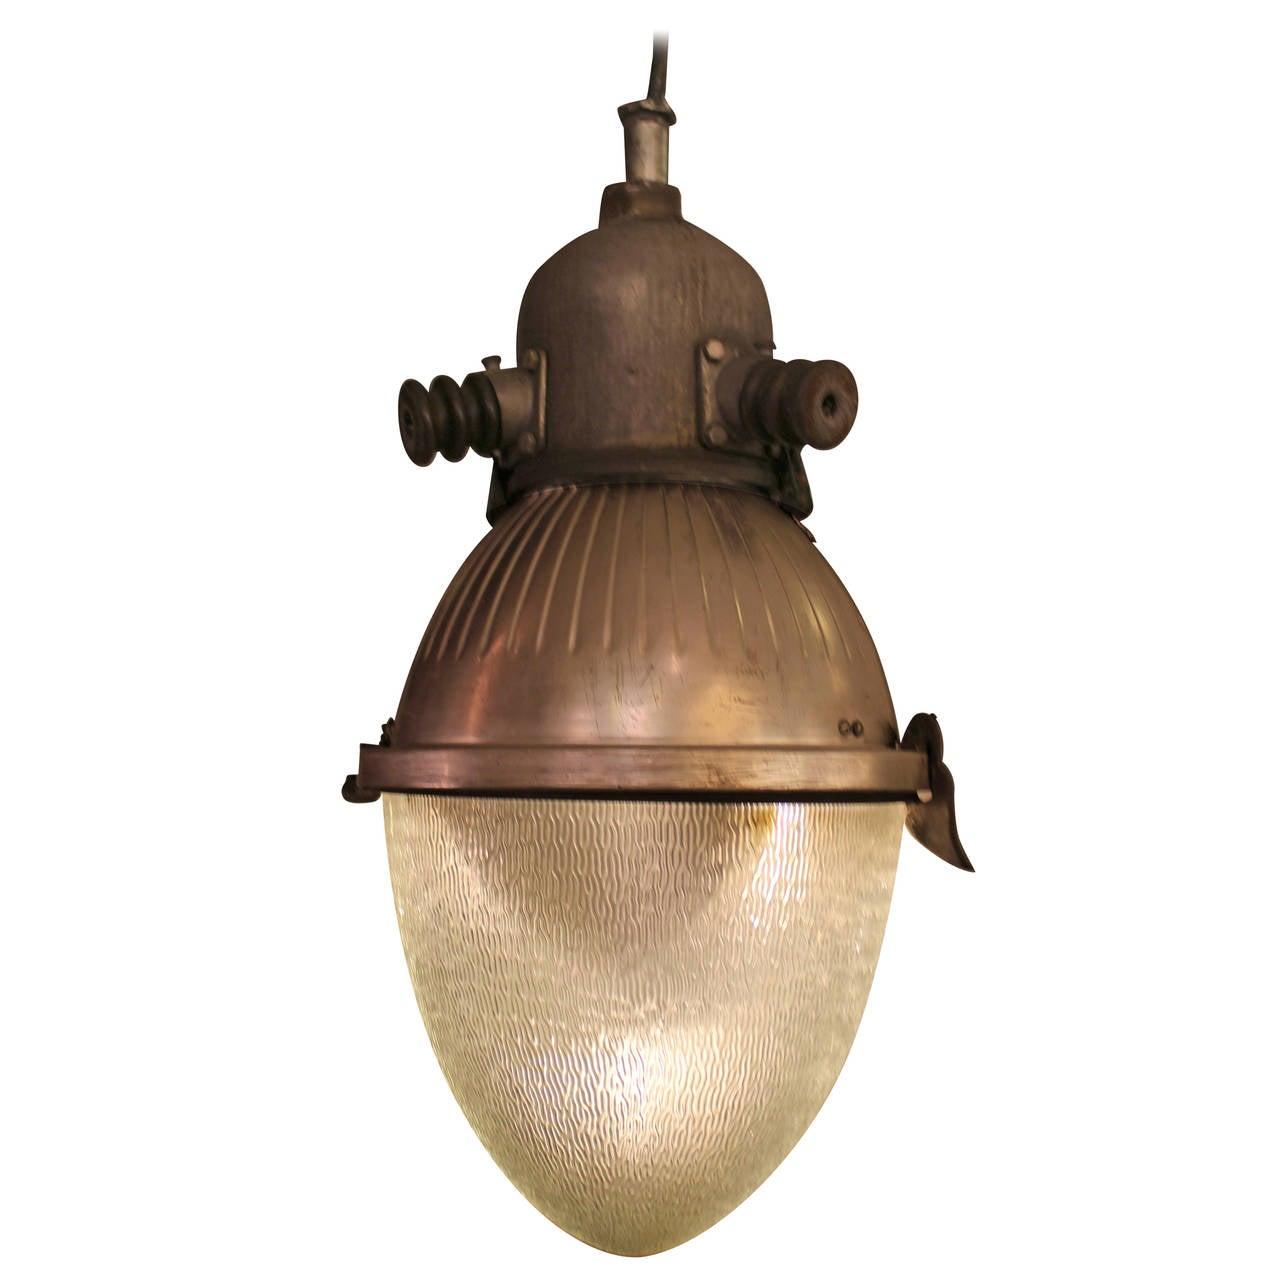 1950s Converted Industrial Quot Egg Quot Street Light Chandelier